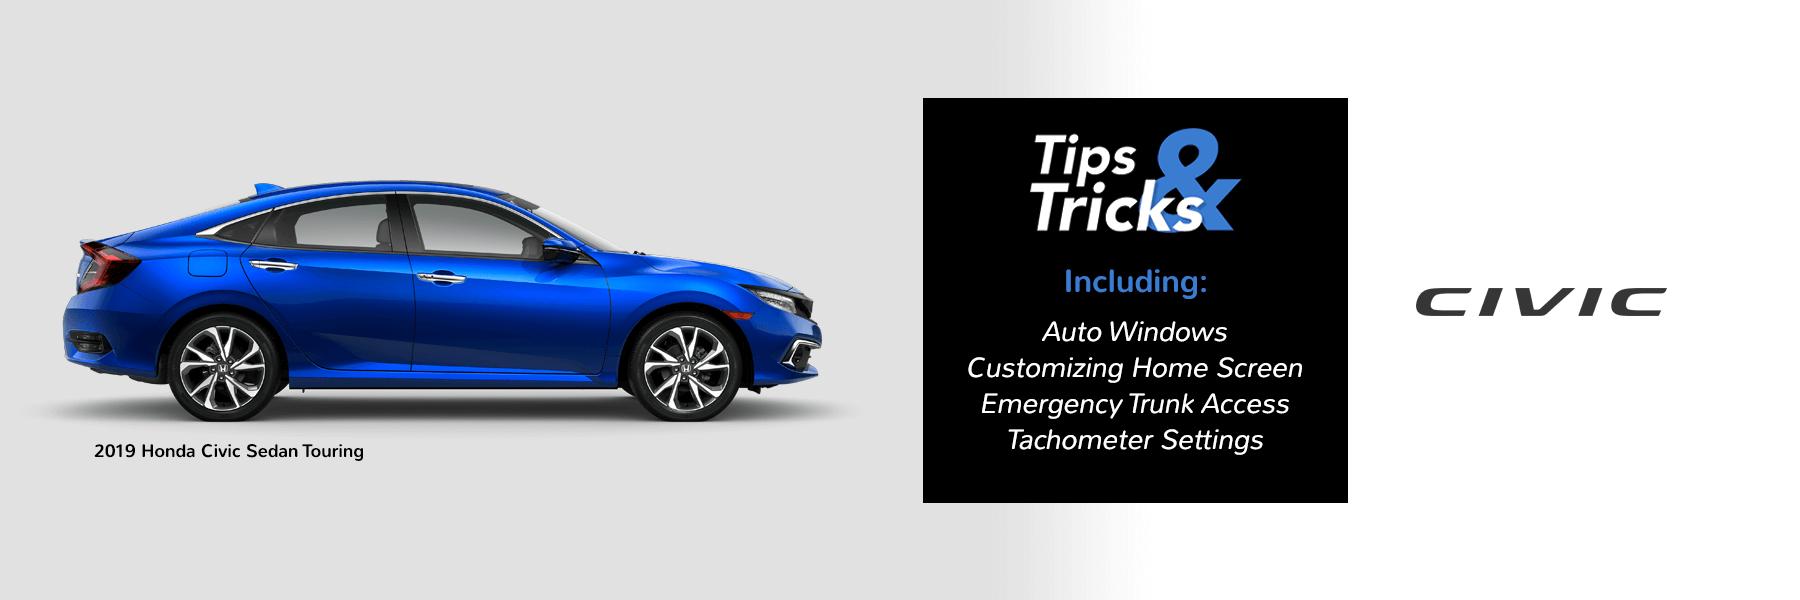 2019 Honda Civic Tips and Tricks Slider